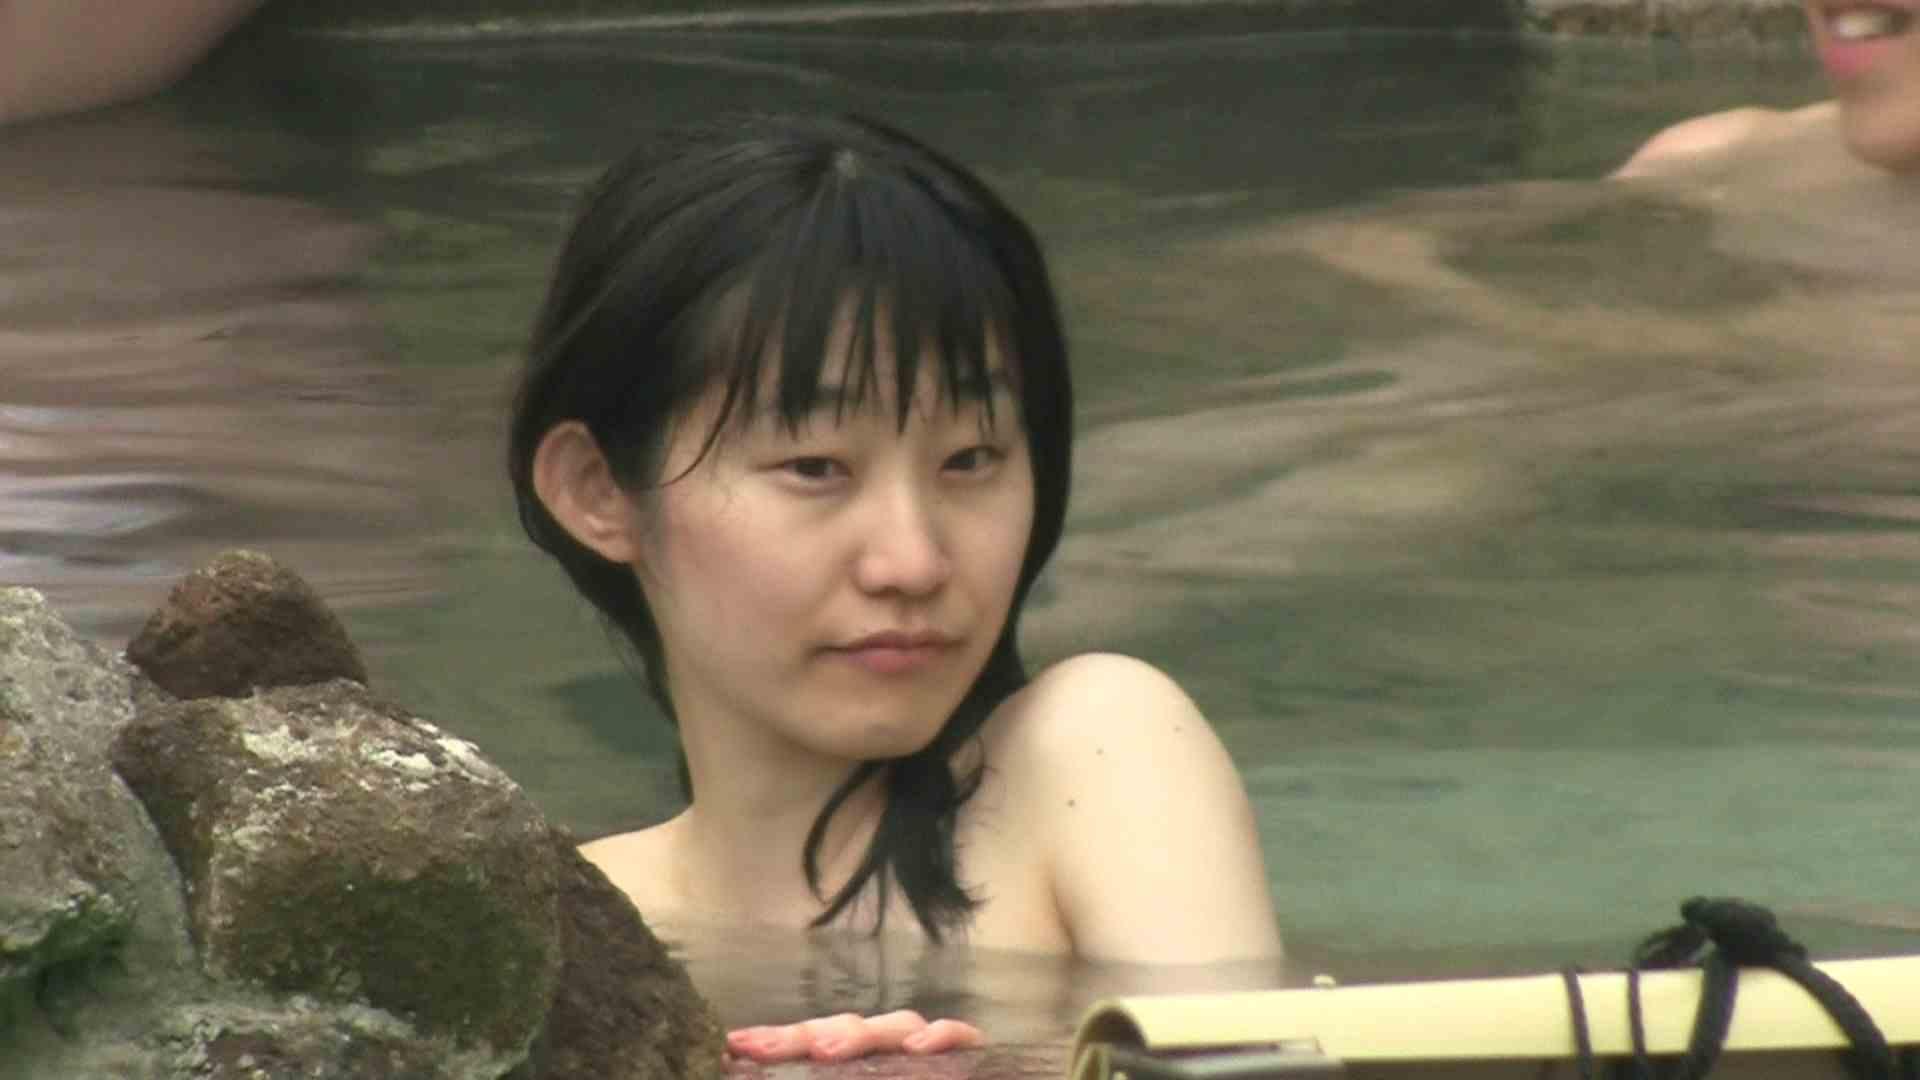 Aquaな露天風呂Vol.14【VIP】 盗撮シリーズ   露天風呂編  94PIX 33